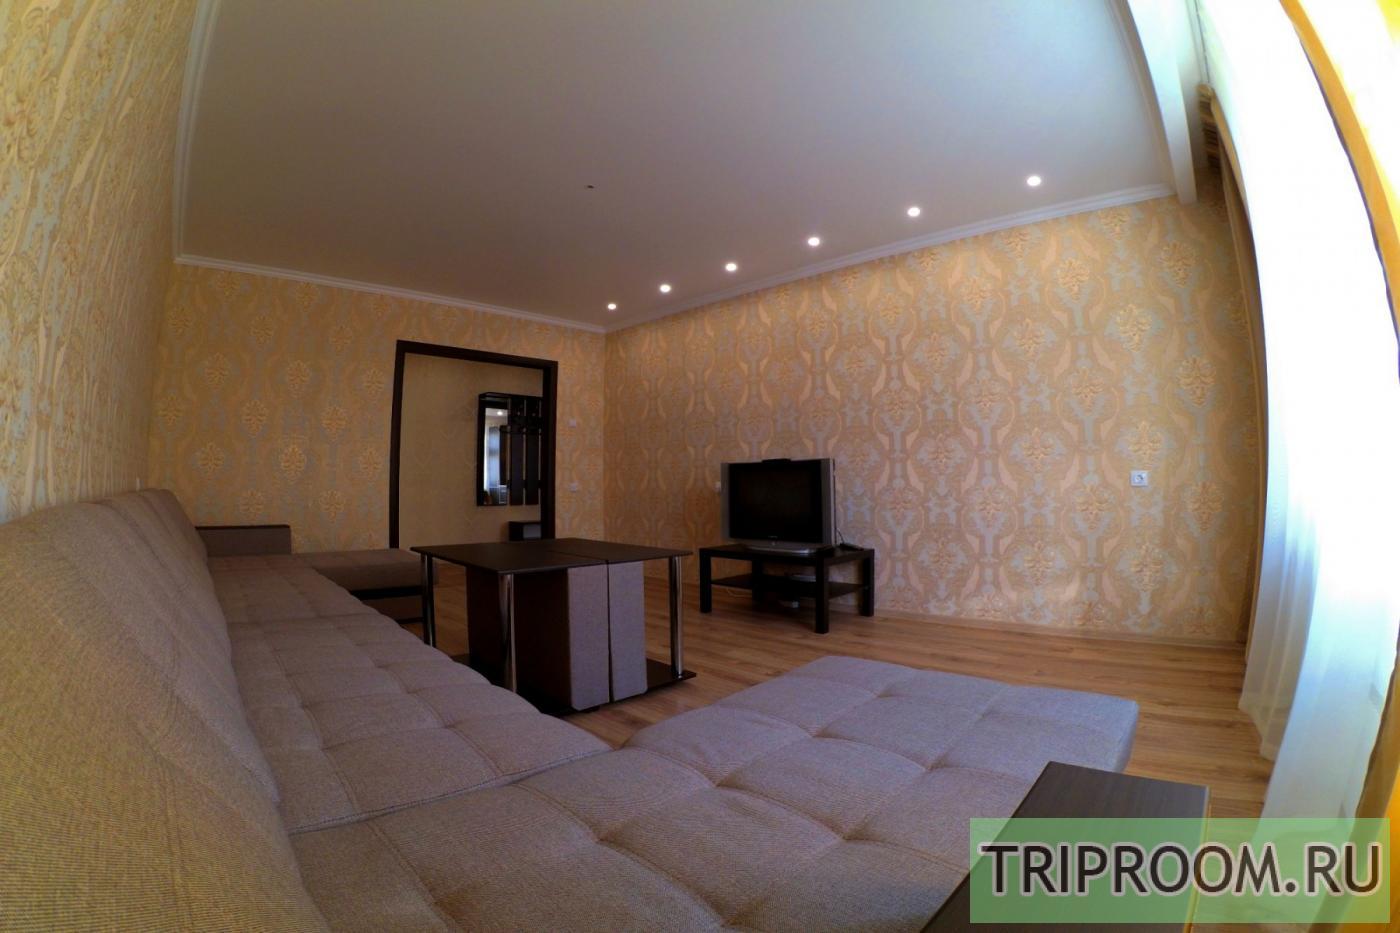 3-комнатная квартира посуточно (вариант № 20683), ул. Рашида Вагапова, фото № 16